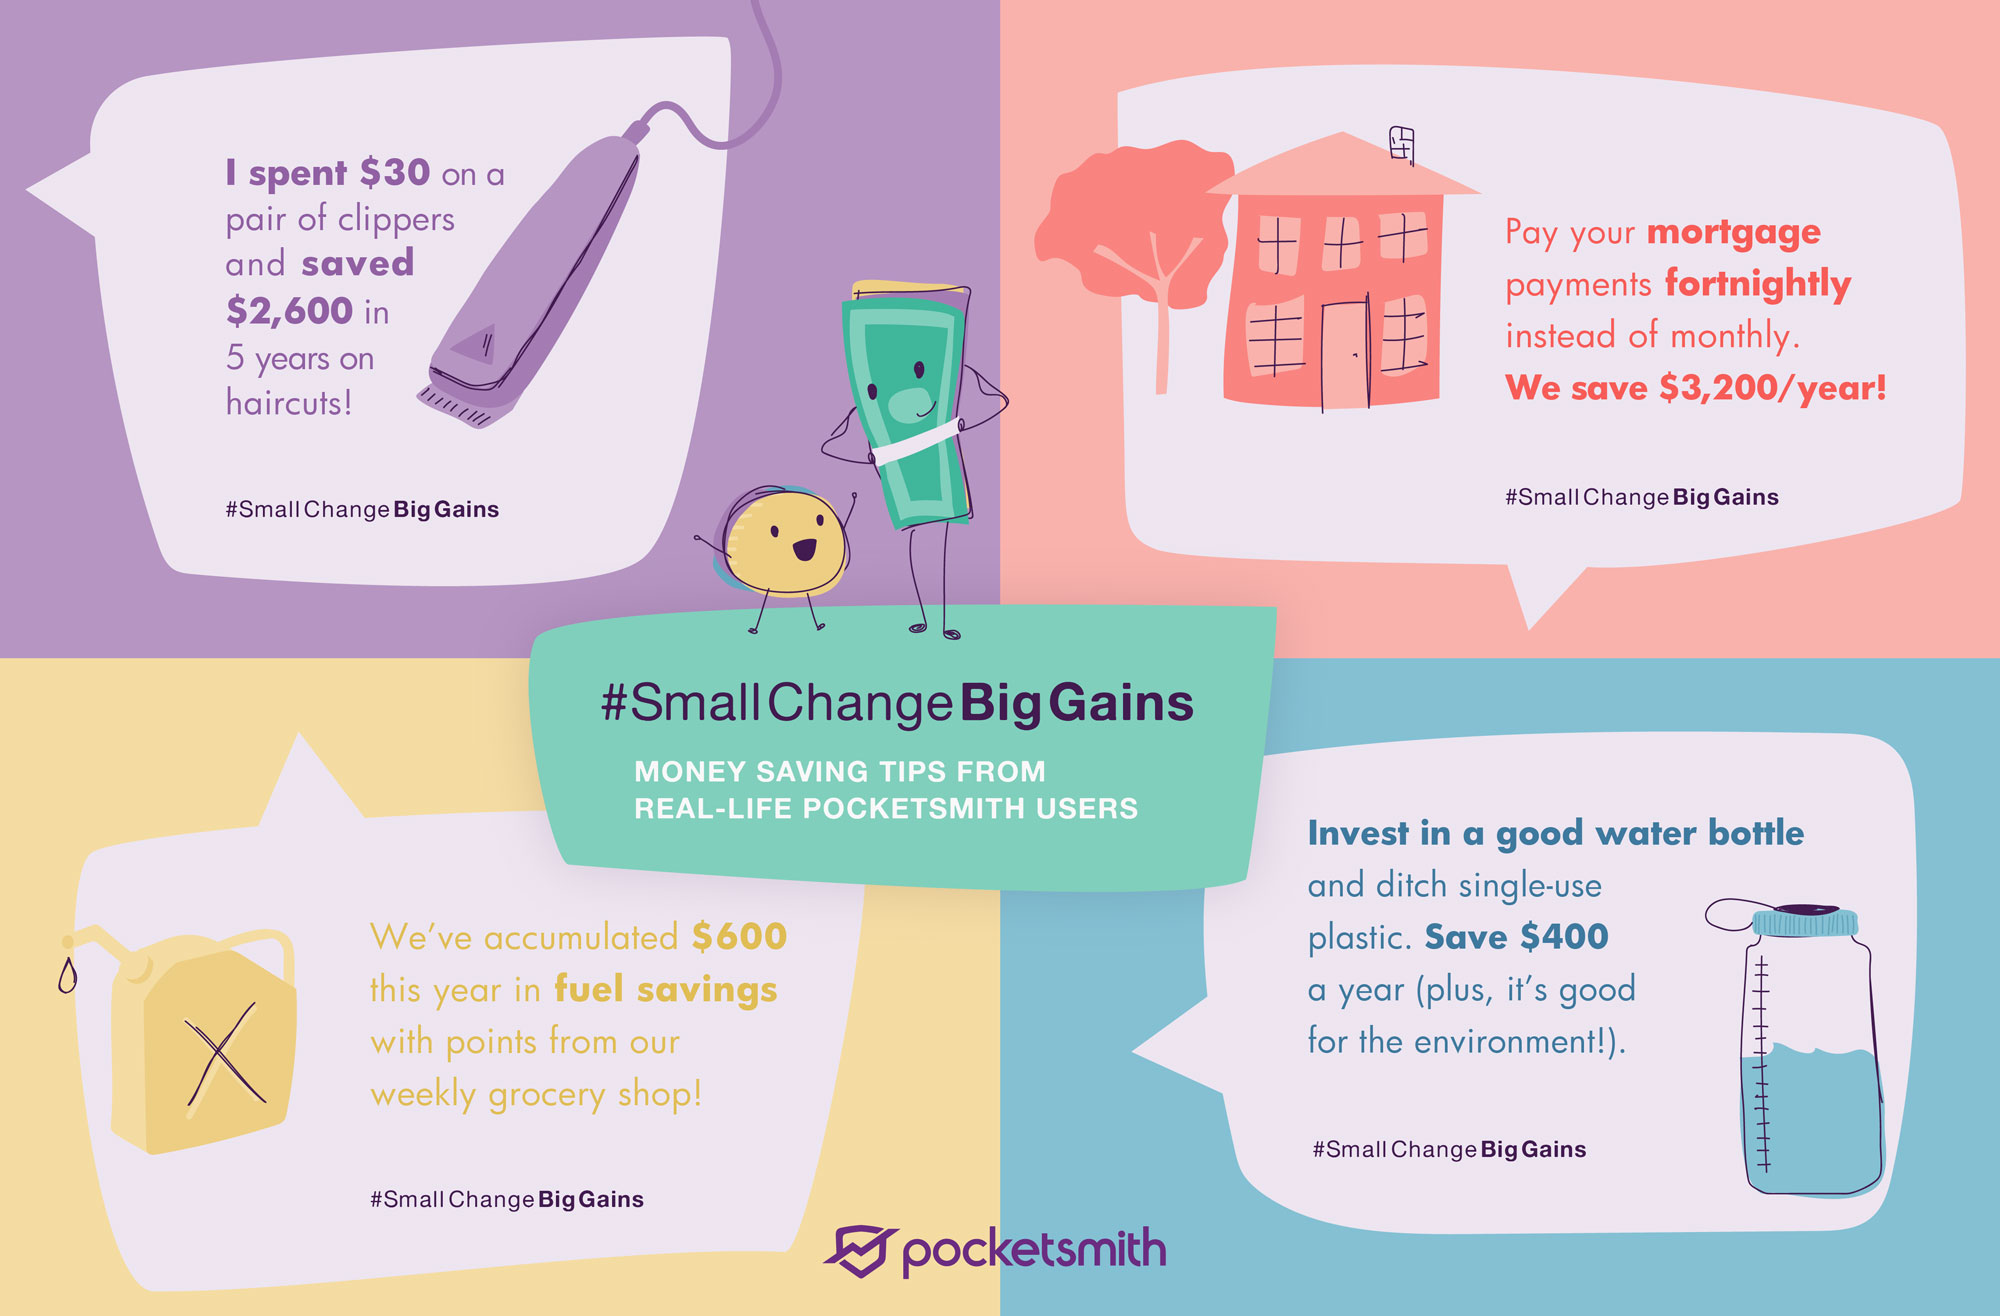 PocketSmith Small Change Big Gains